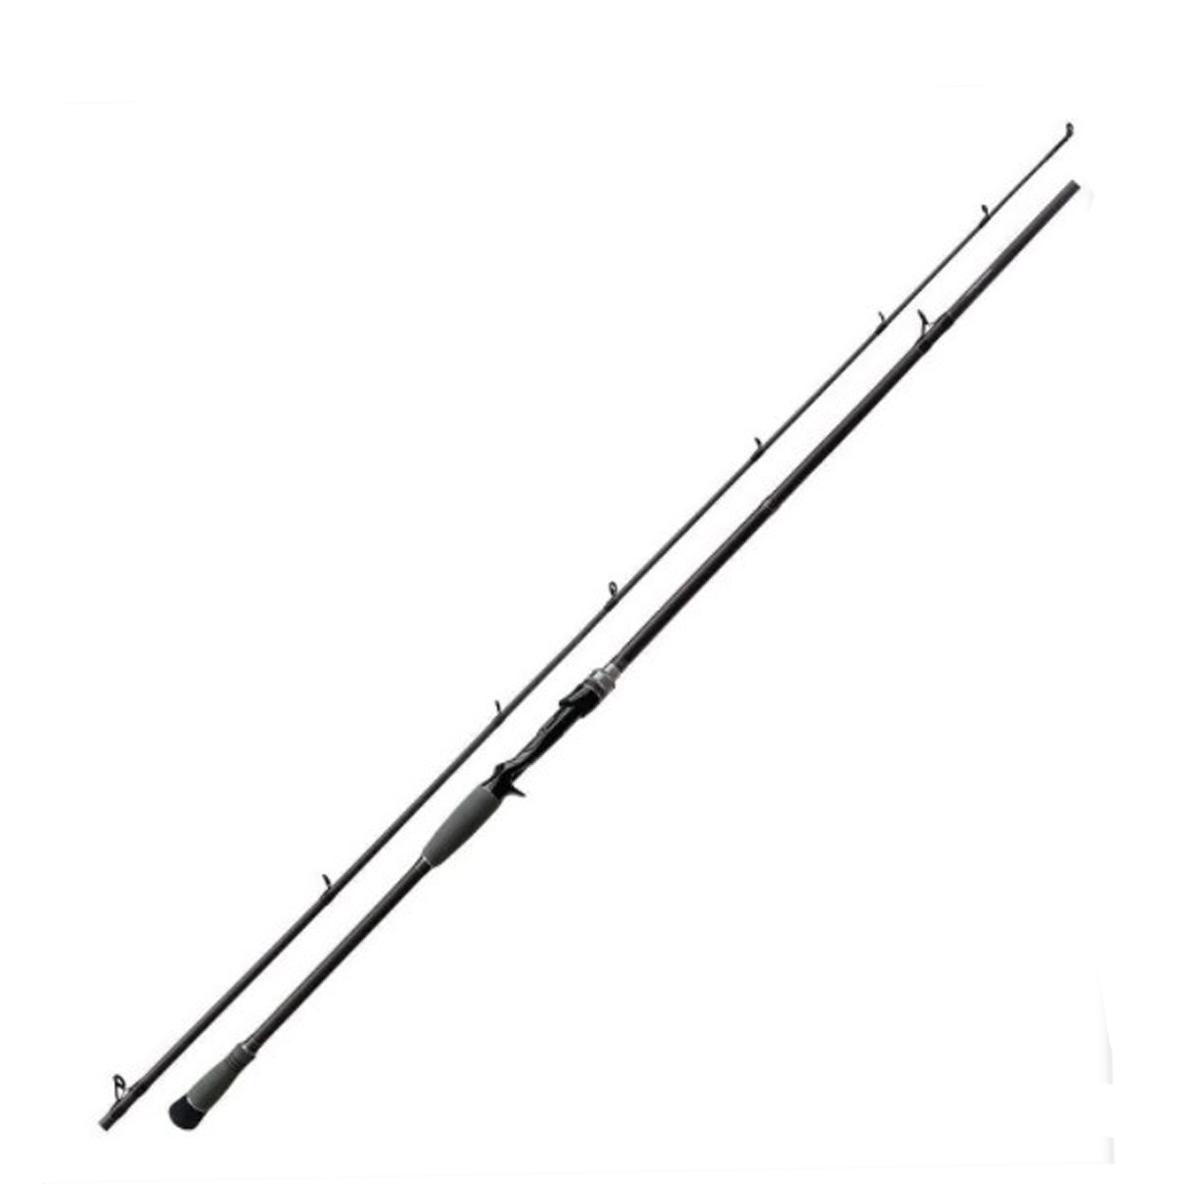 Vara Lumis Virotty p/ Carretilha 2,30 m 30 lbs (Upset)  - Pró Pesca Shop